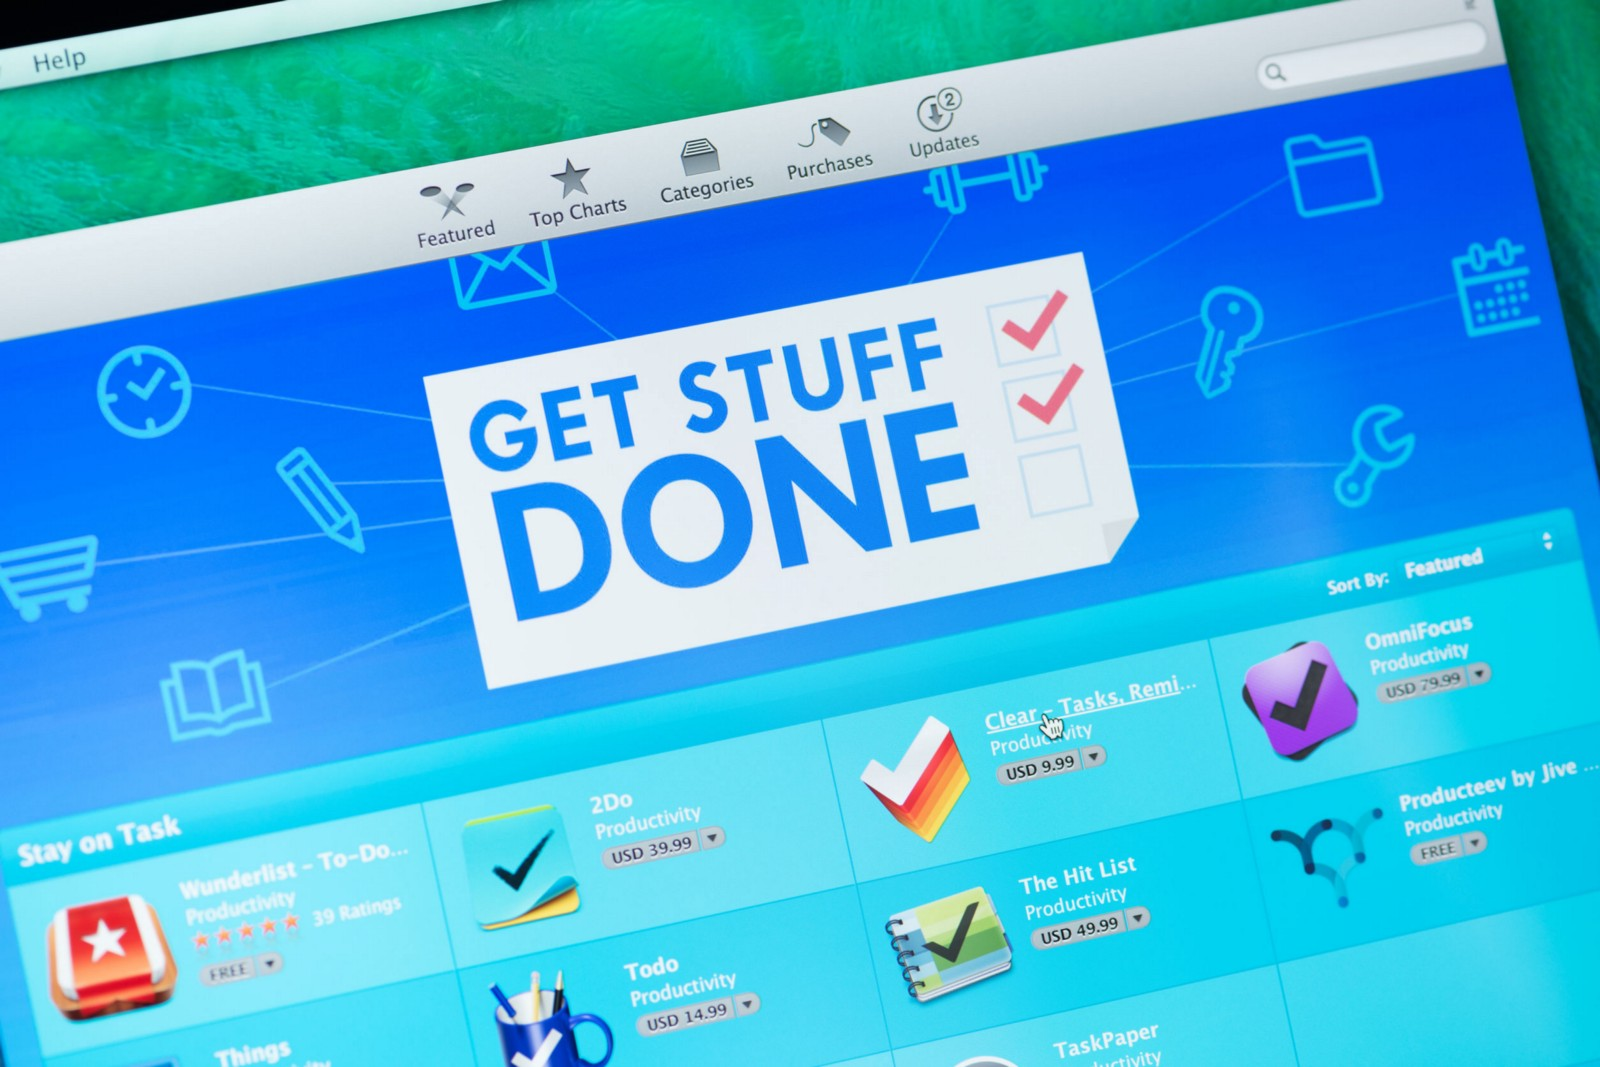 Productivity eTools: Be Organized & Get Stuff Done 7/1